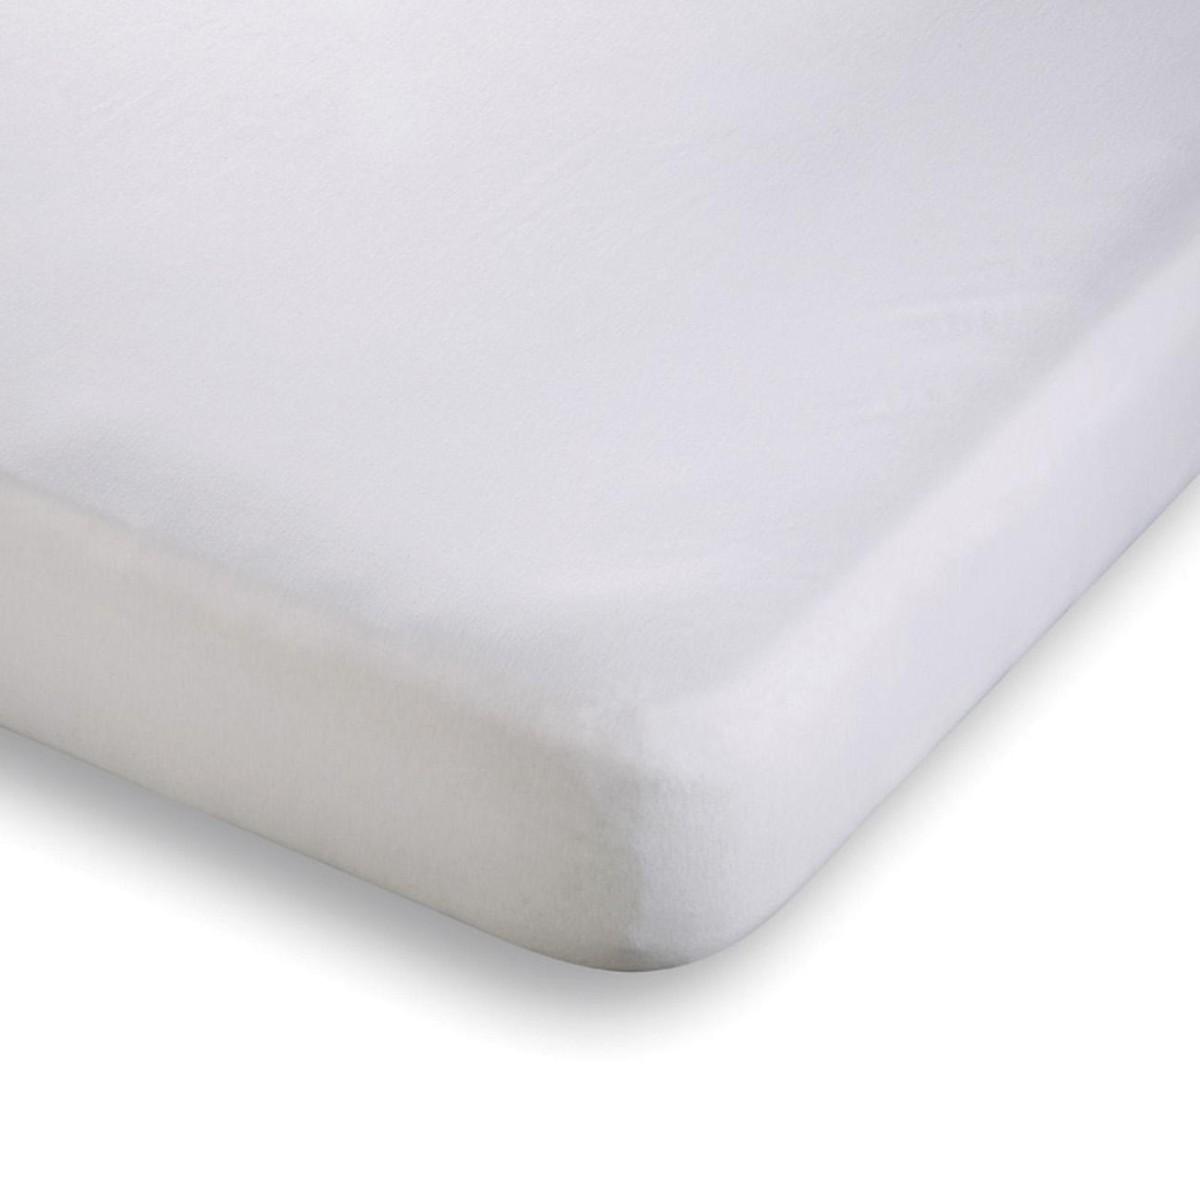 Protector colchon algodon 100/% rizo funda impermeable cama 60 80 90 105 135 150